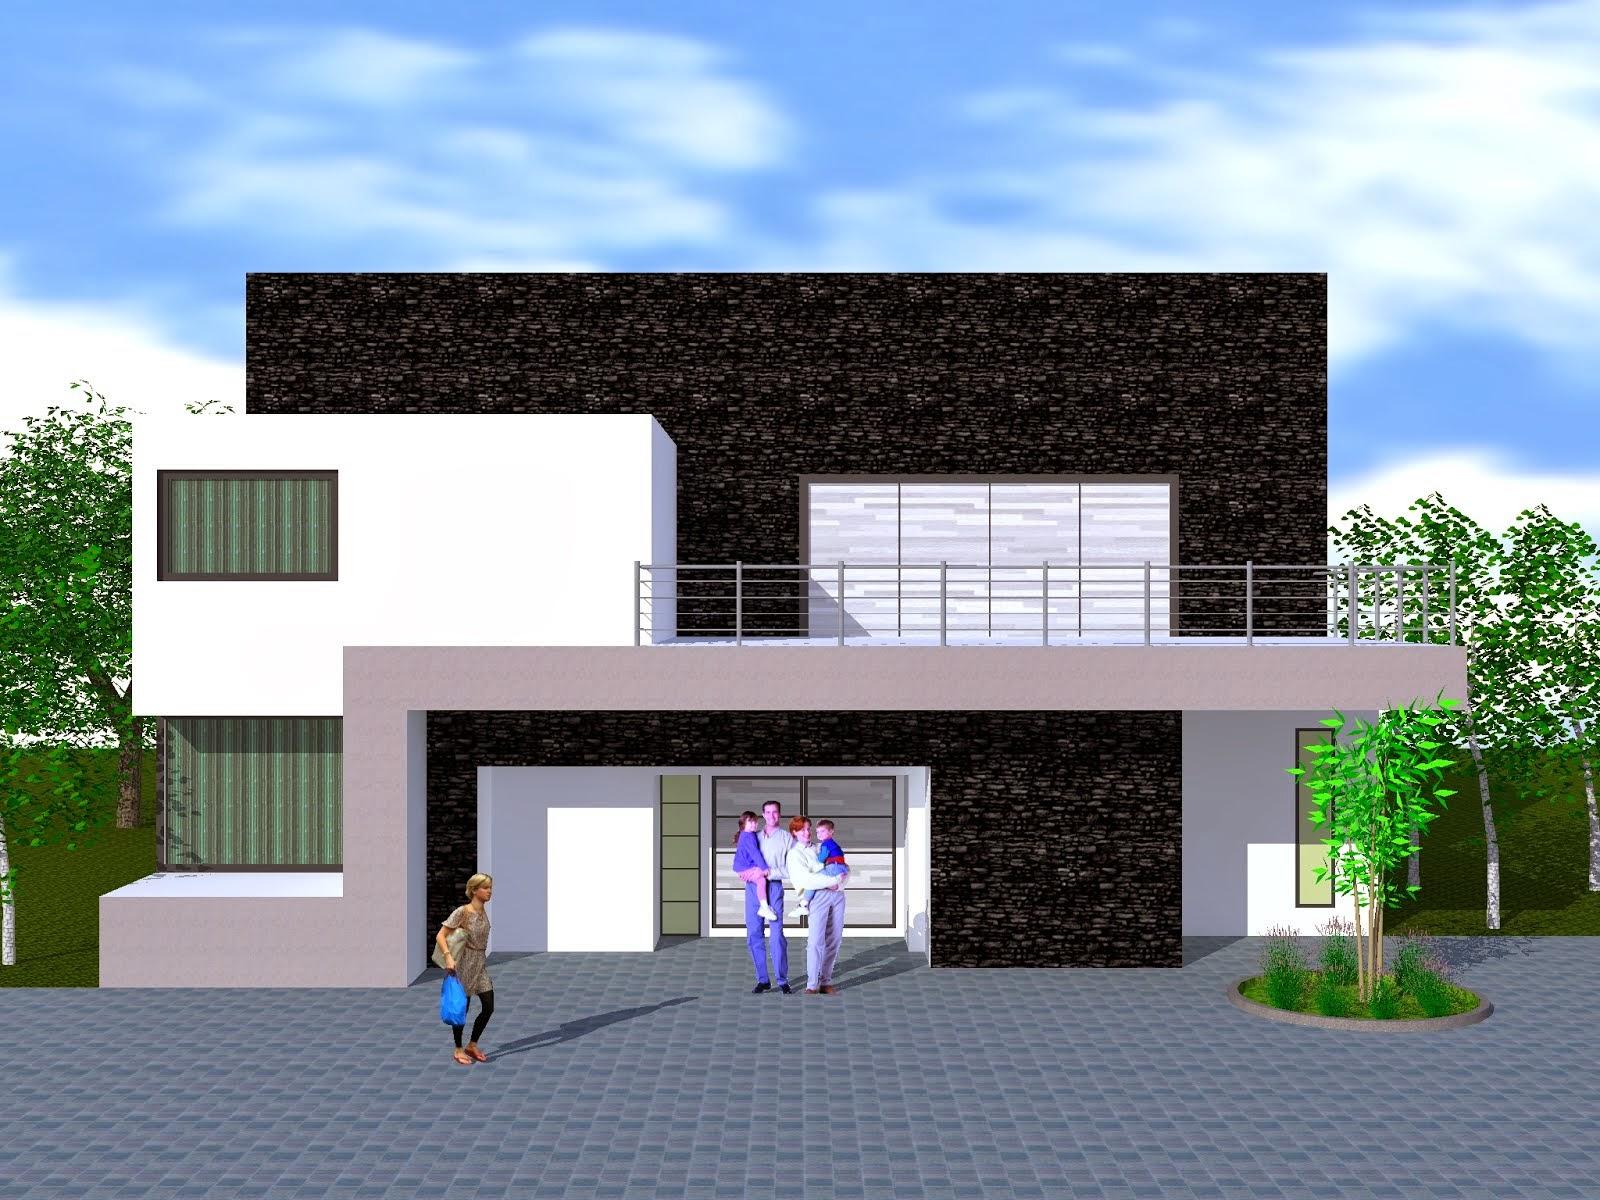 Fachadas y casas excelentes im genes de fachadas for Disenos para frentes de casas